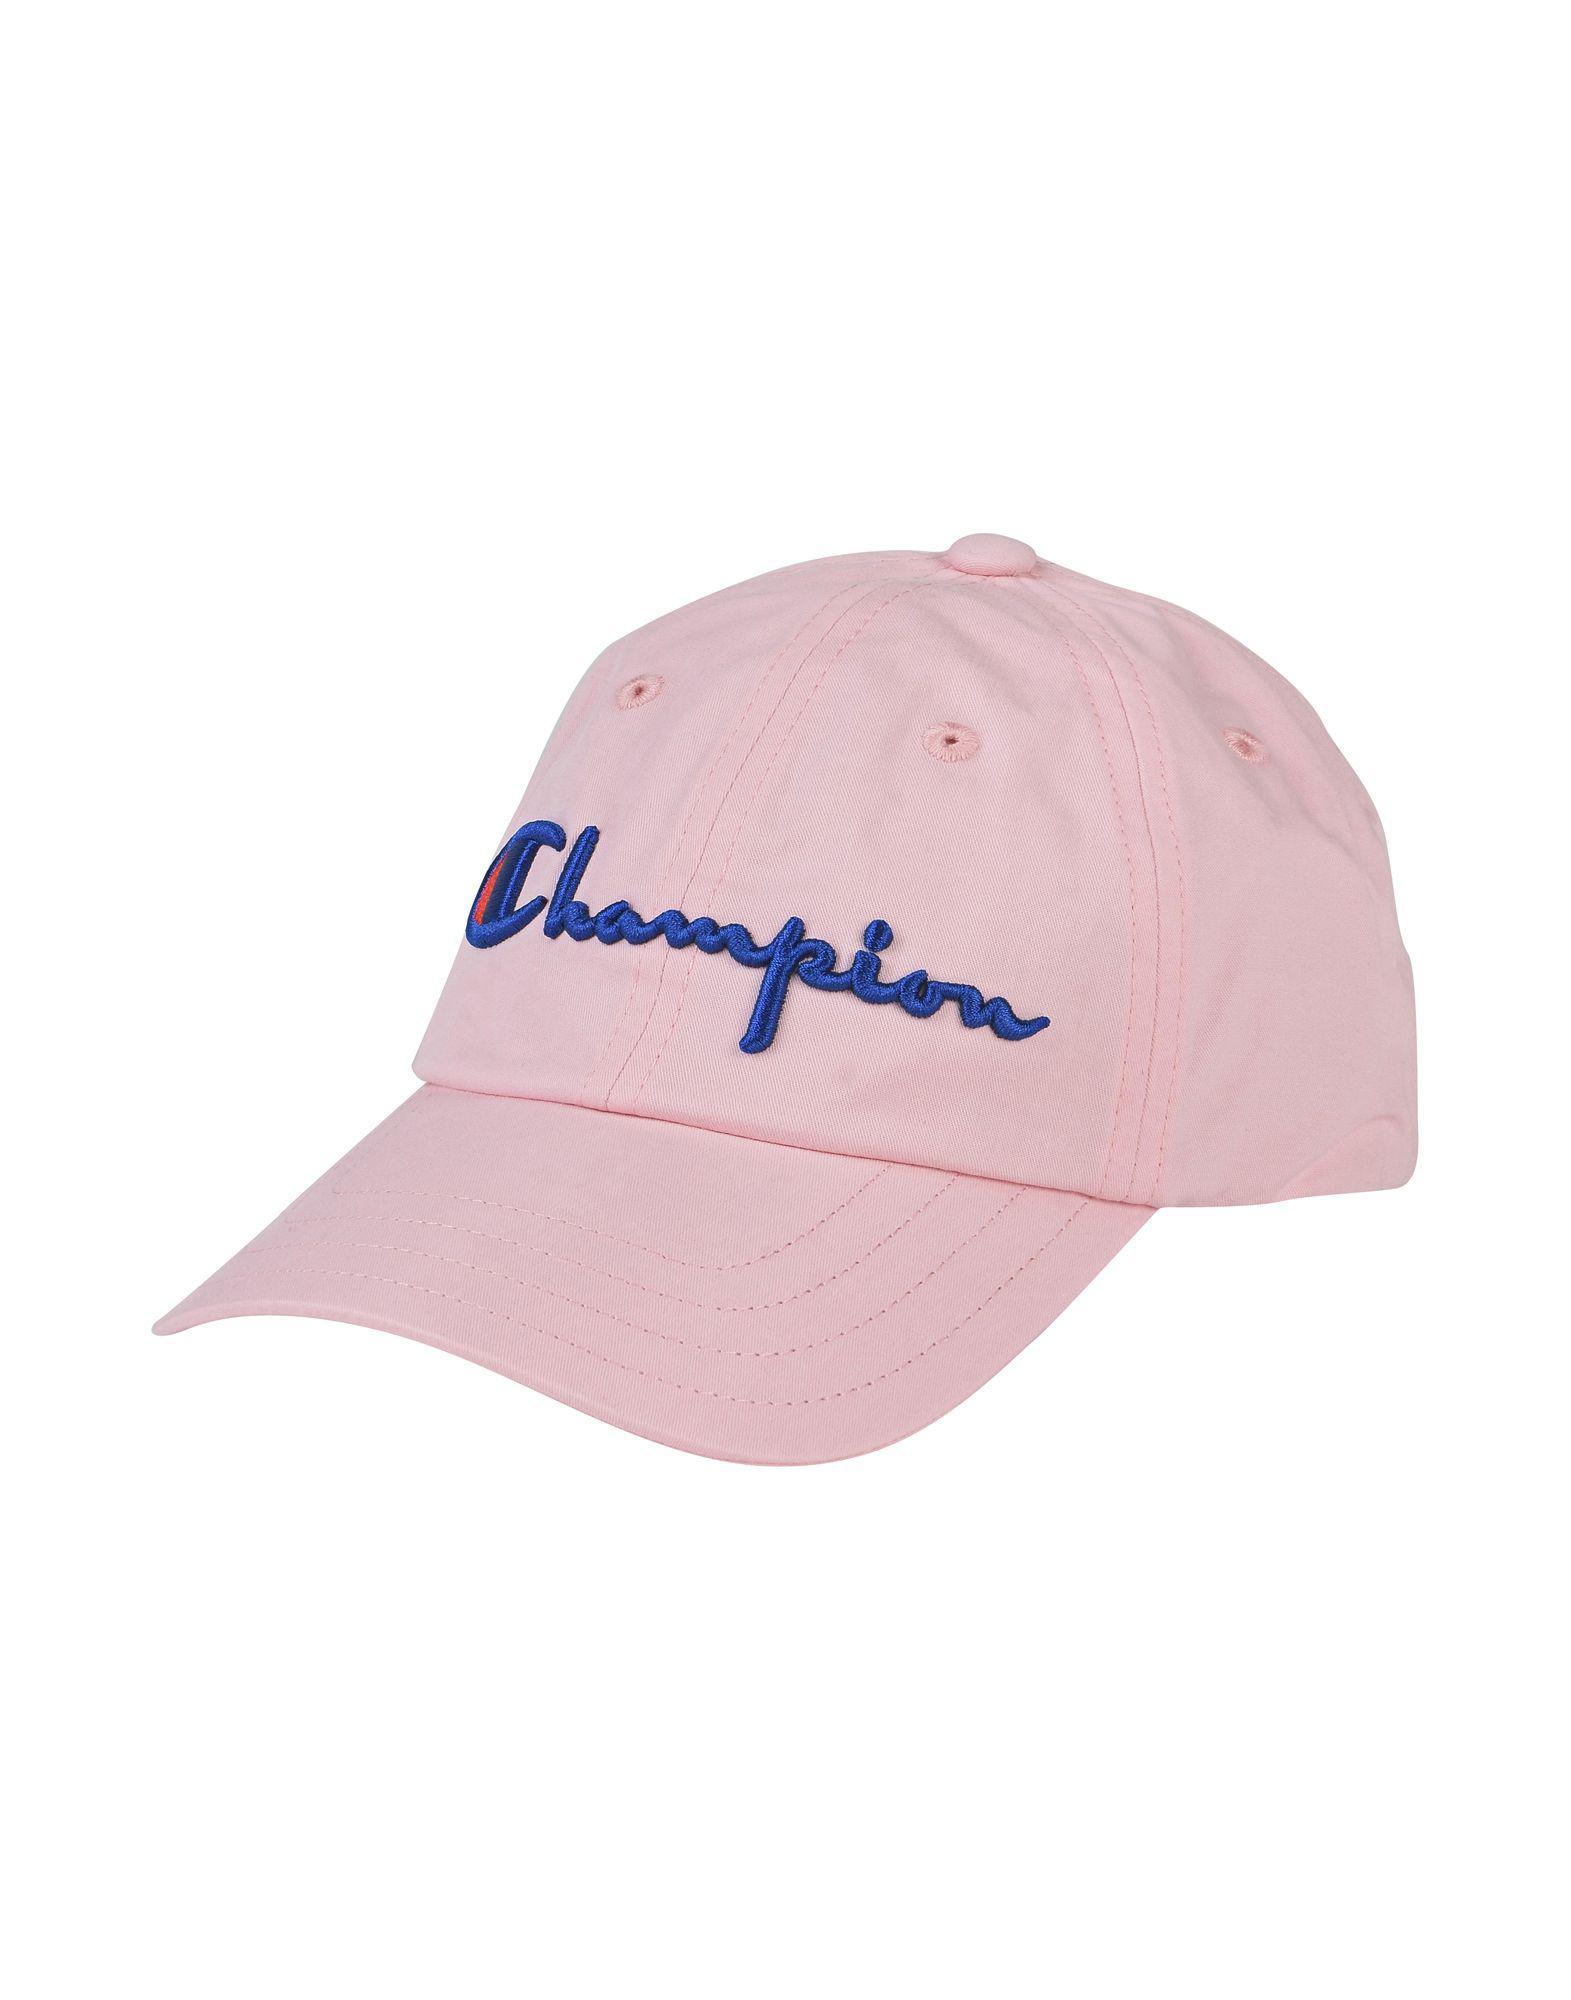 1affbd4e8 australia pink champion hat f7258 1ca0b